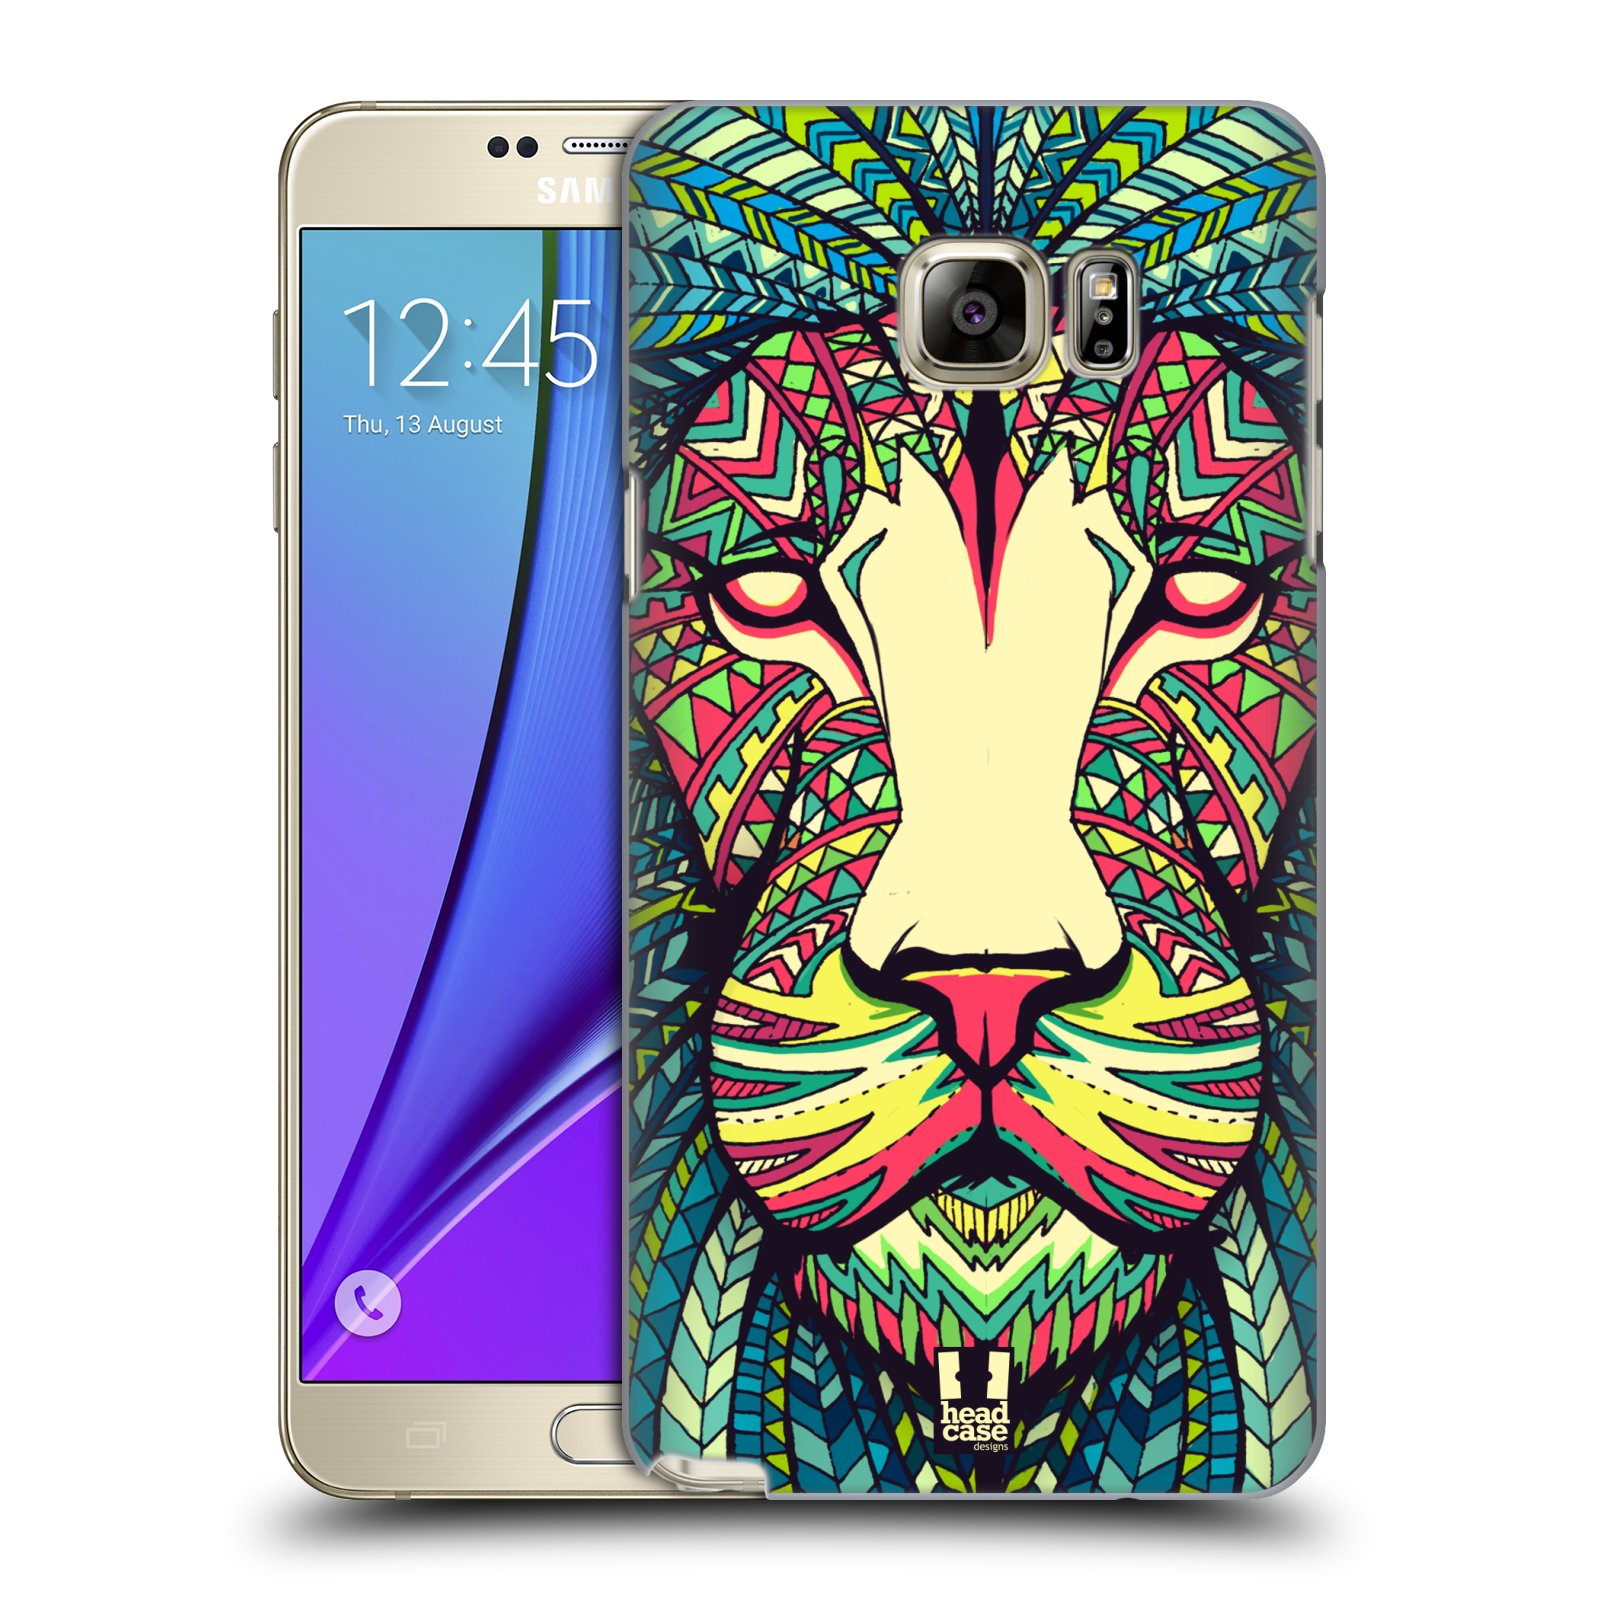 HEAD CASE plastový obal na mobil SAMSUNG Galaxy Note 5 (N920) vzor Aztécký motiv zvíře lev